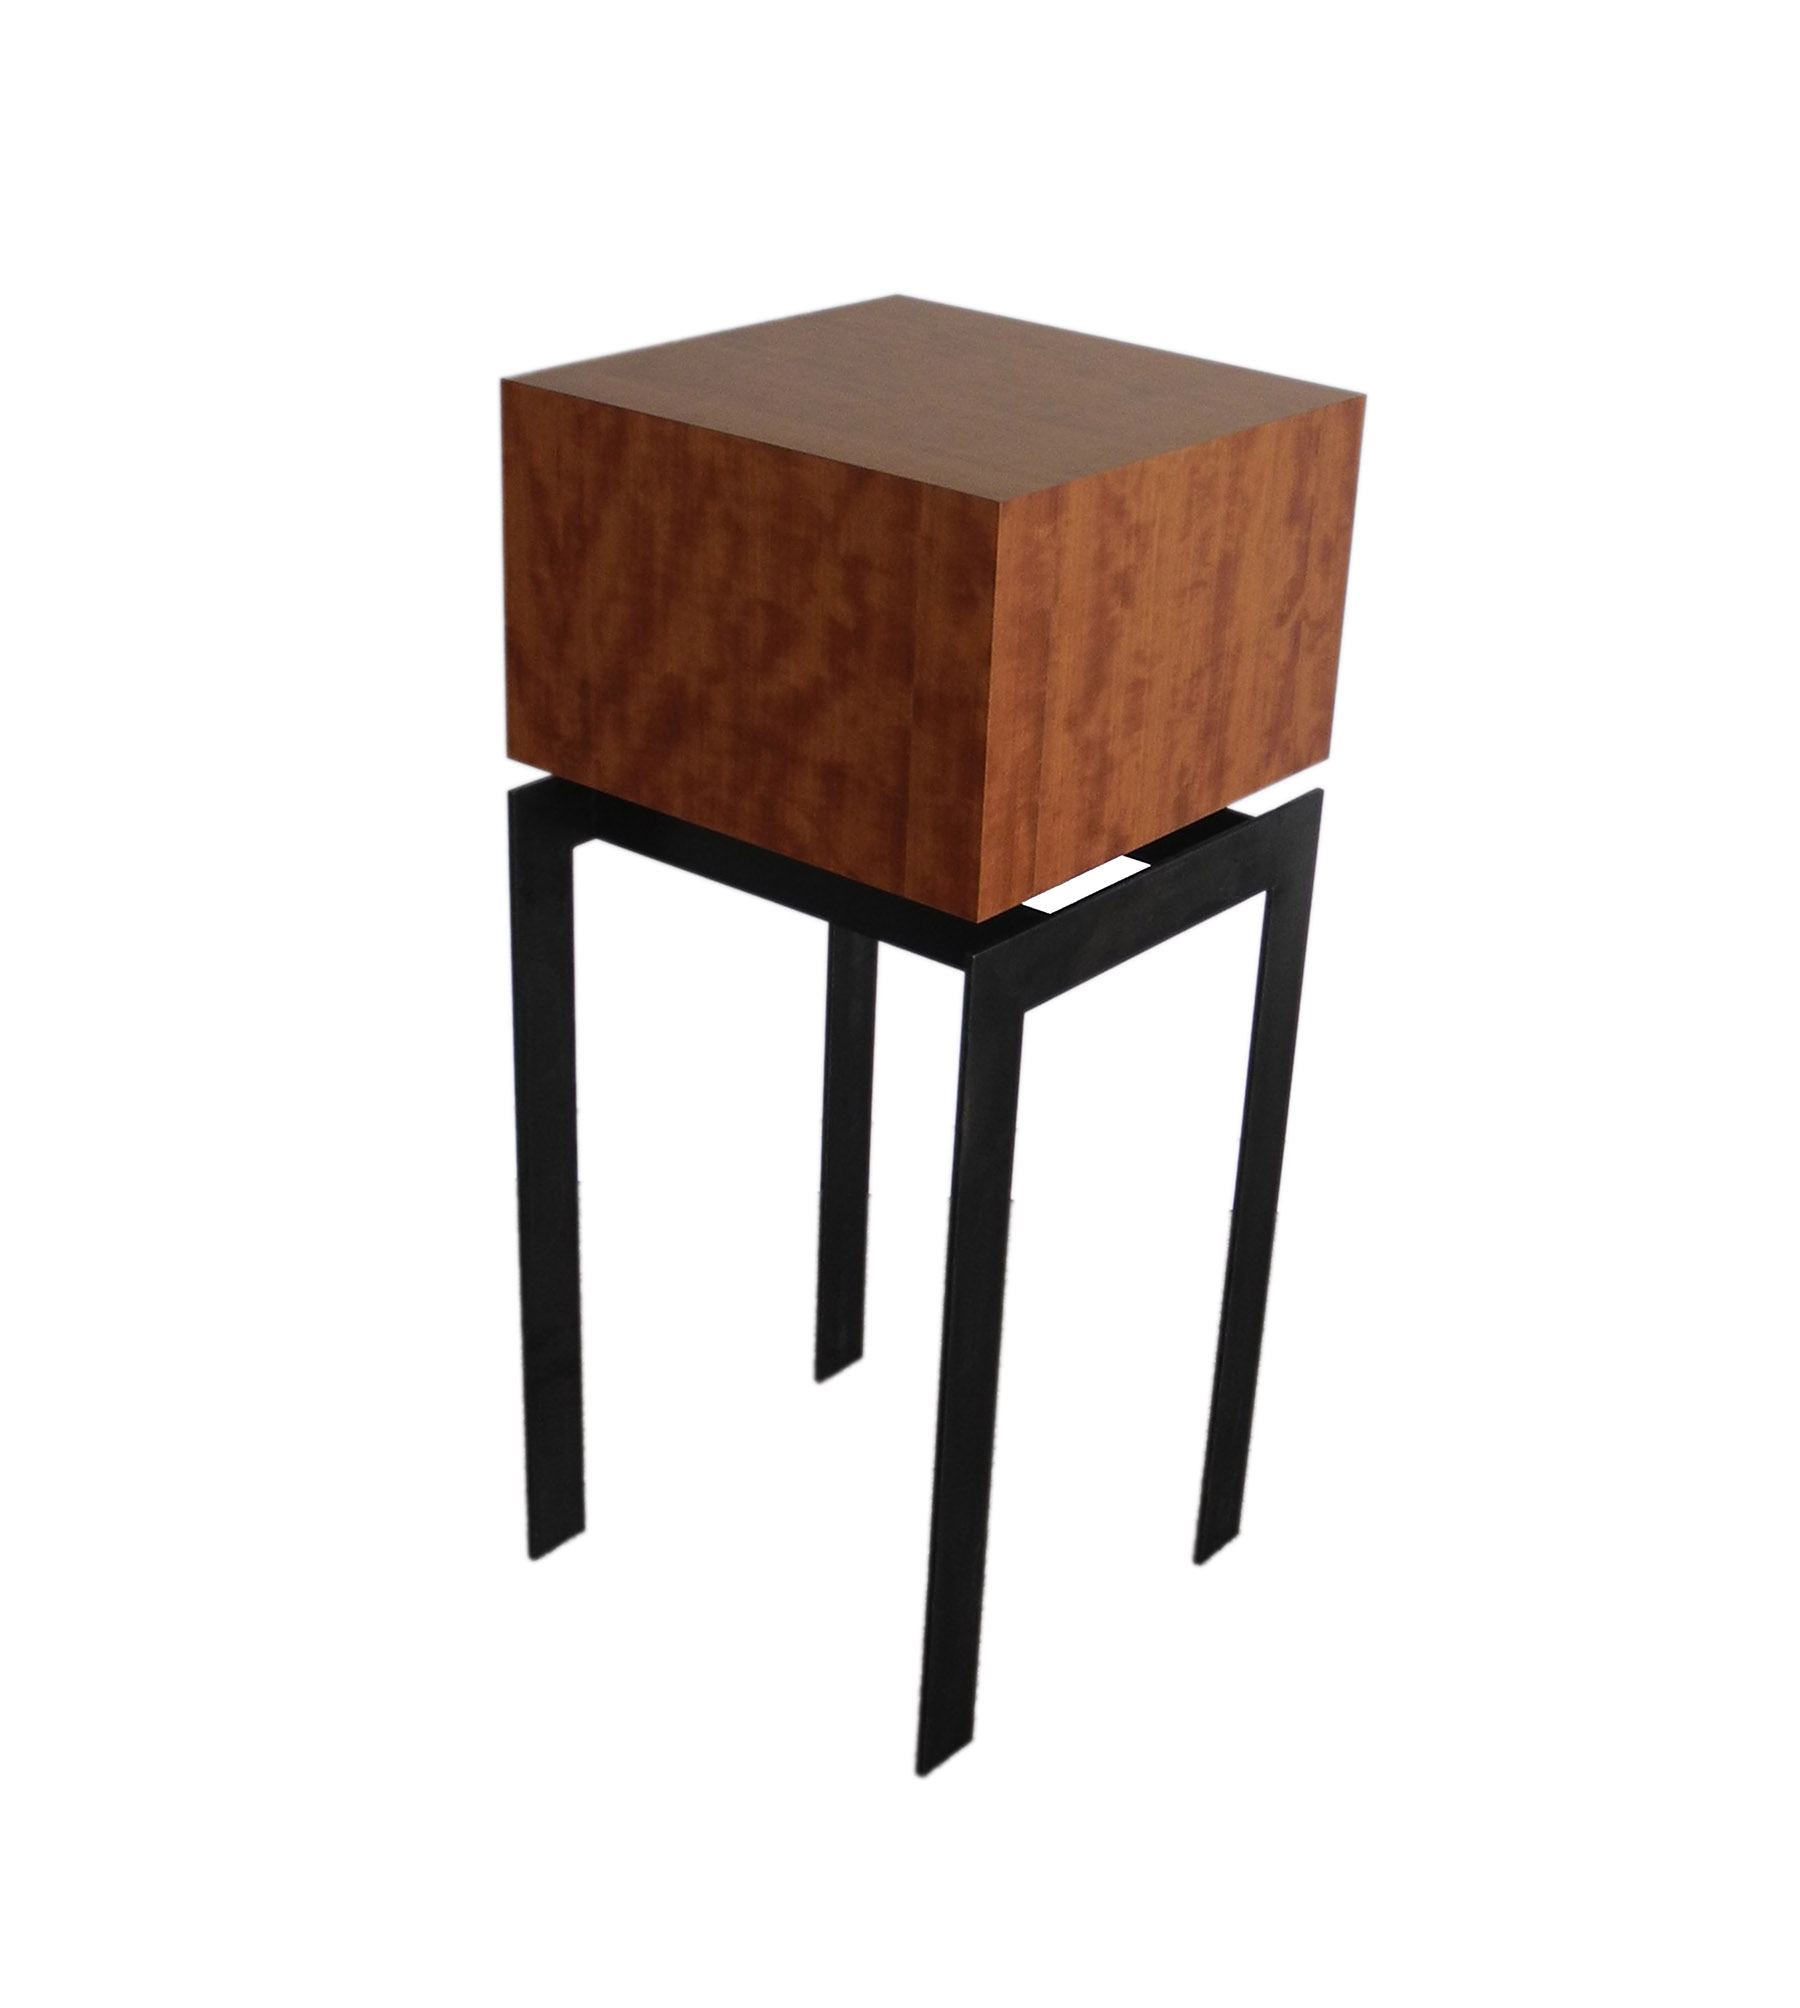 display pedestal end table square makore wood